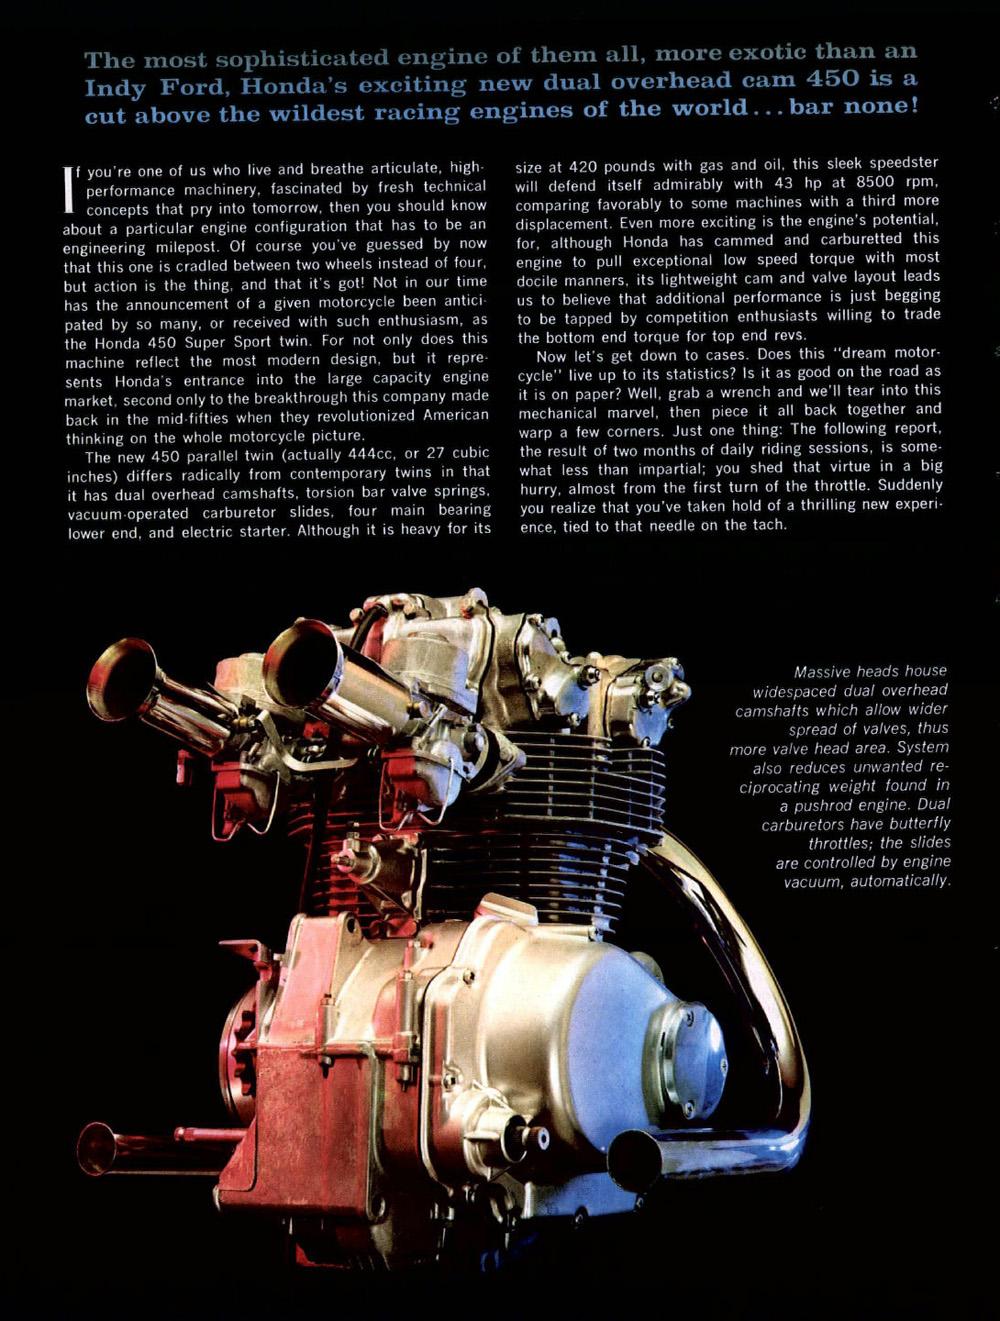 Honda 450 Engine tech article 02.jpg